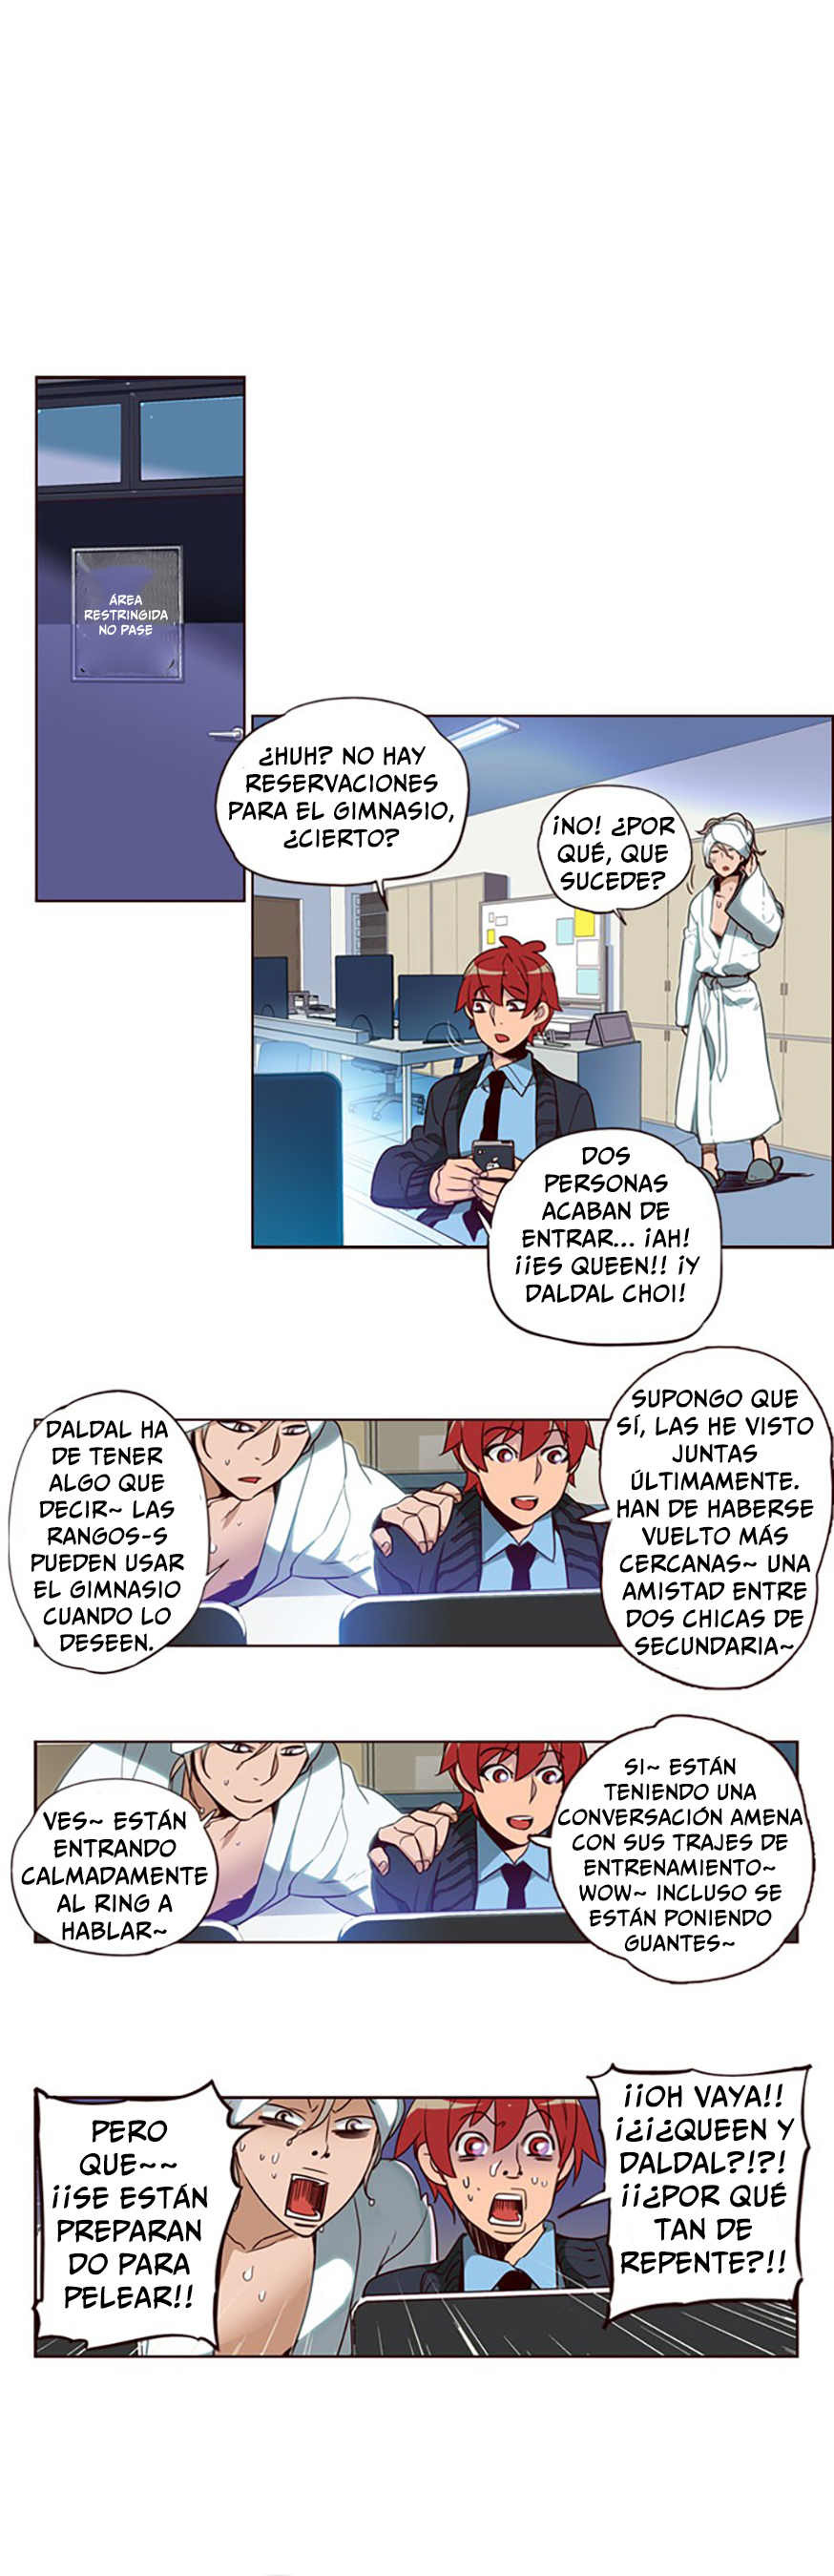 http://c5.ninemanga.com/es_manga/32/416/361799/a77520dcdffad519983fef3884d172e1.jpg Page 10